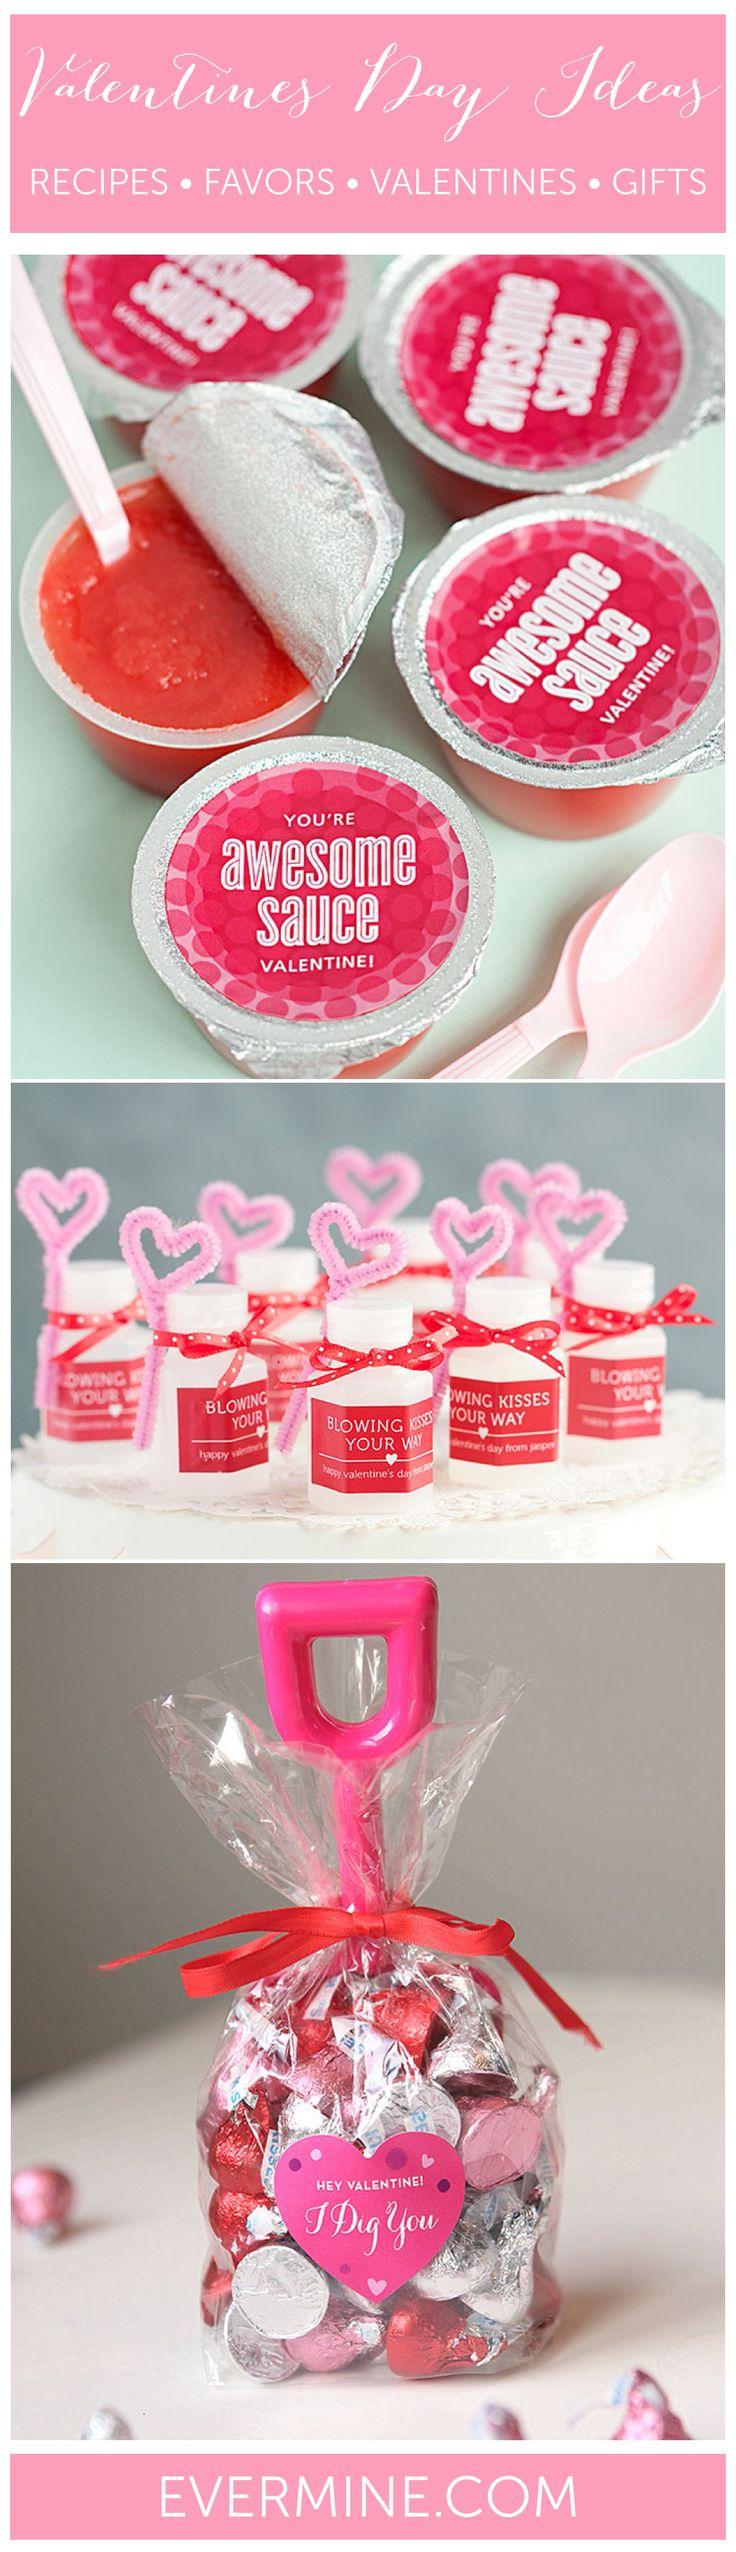 Valentines Day Ideas | Valentines Recipes, Favors, Crafts, Gifts, Kids Valentines | Evermine.com